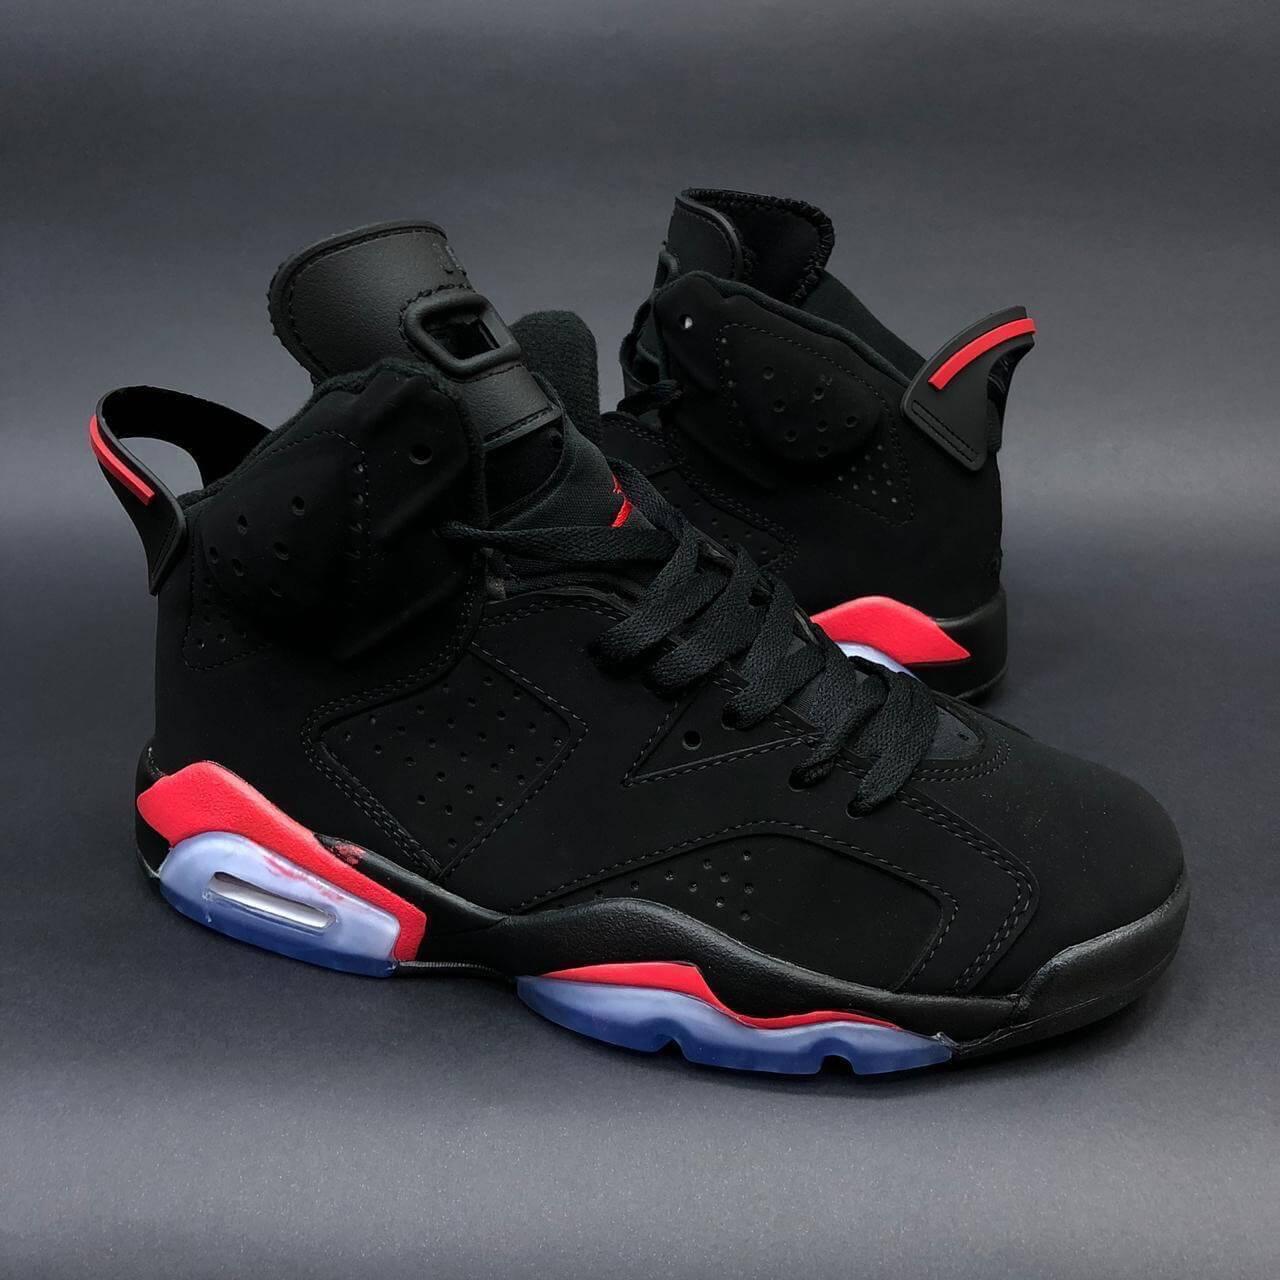 Zapatillas Tenis para Hombre Nike Air Jordan 6 Retro Negro